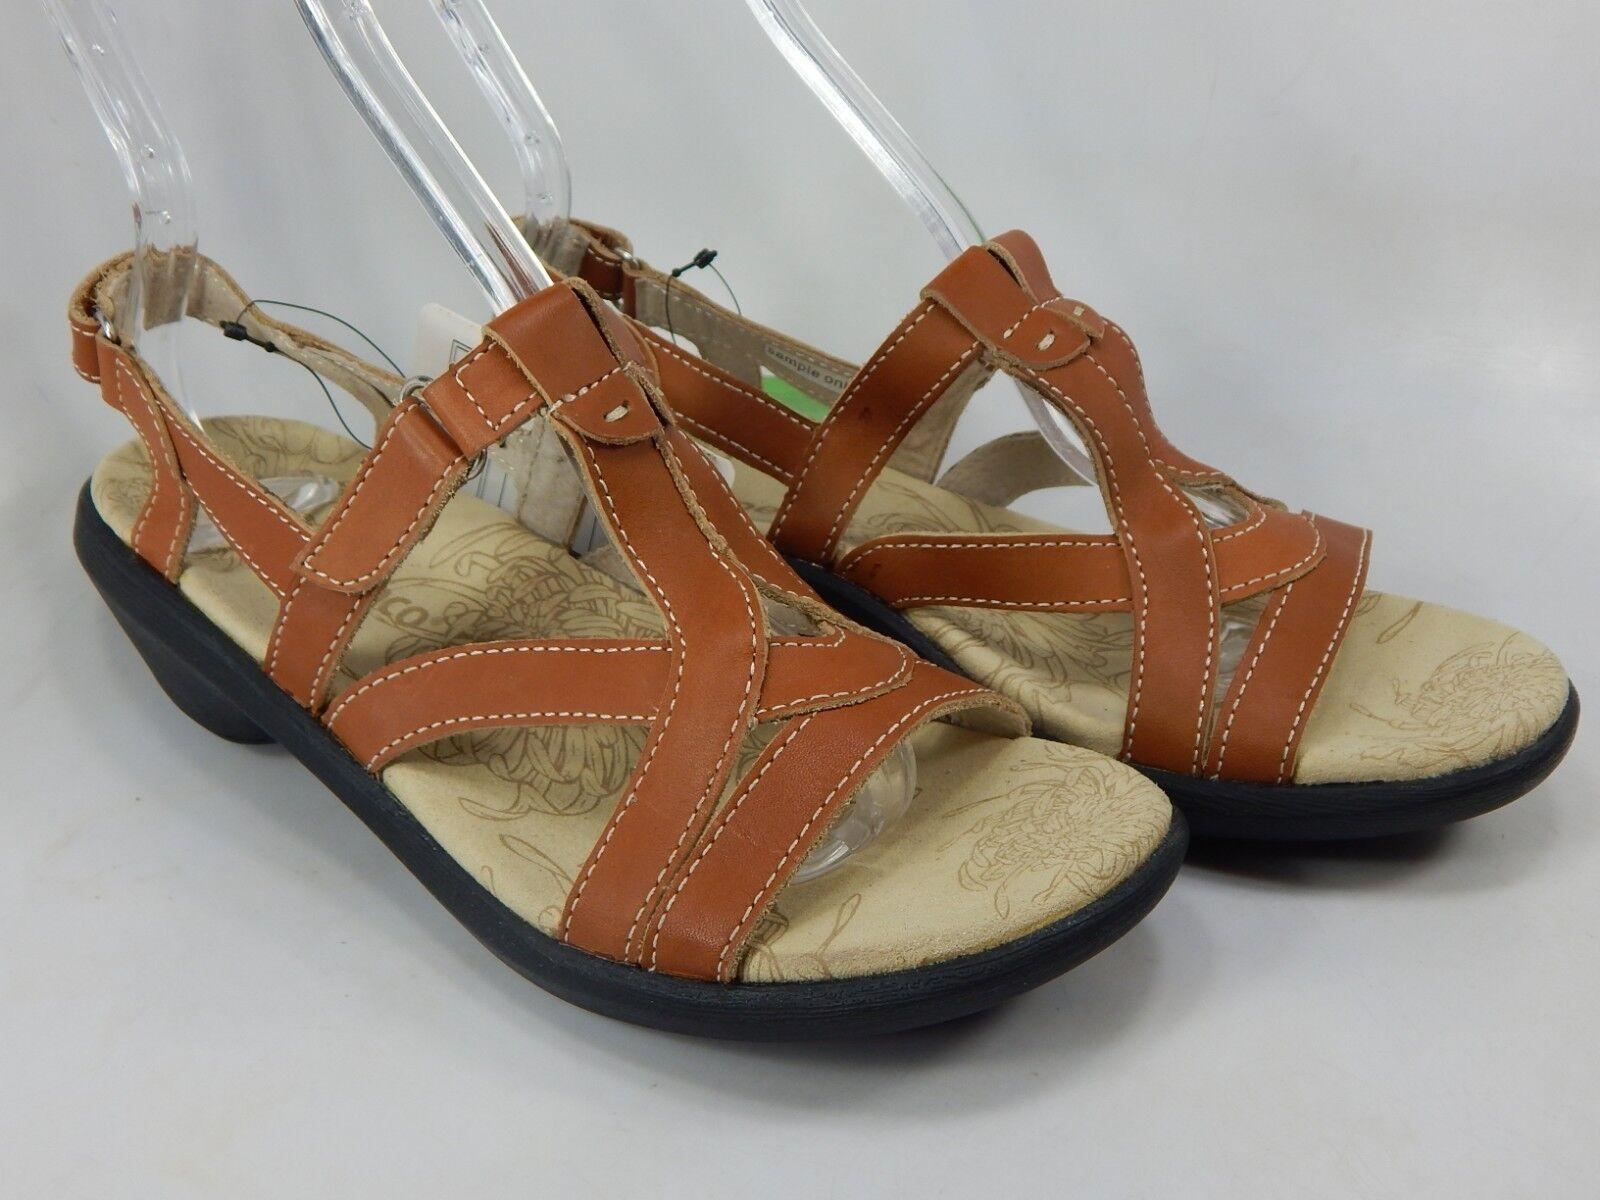 Spenco Charlotte Size 7 M (B) Women's Dress Casual Leather Strap Sandals